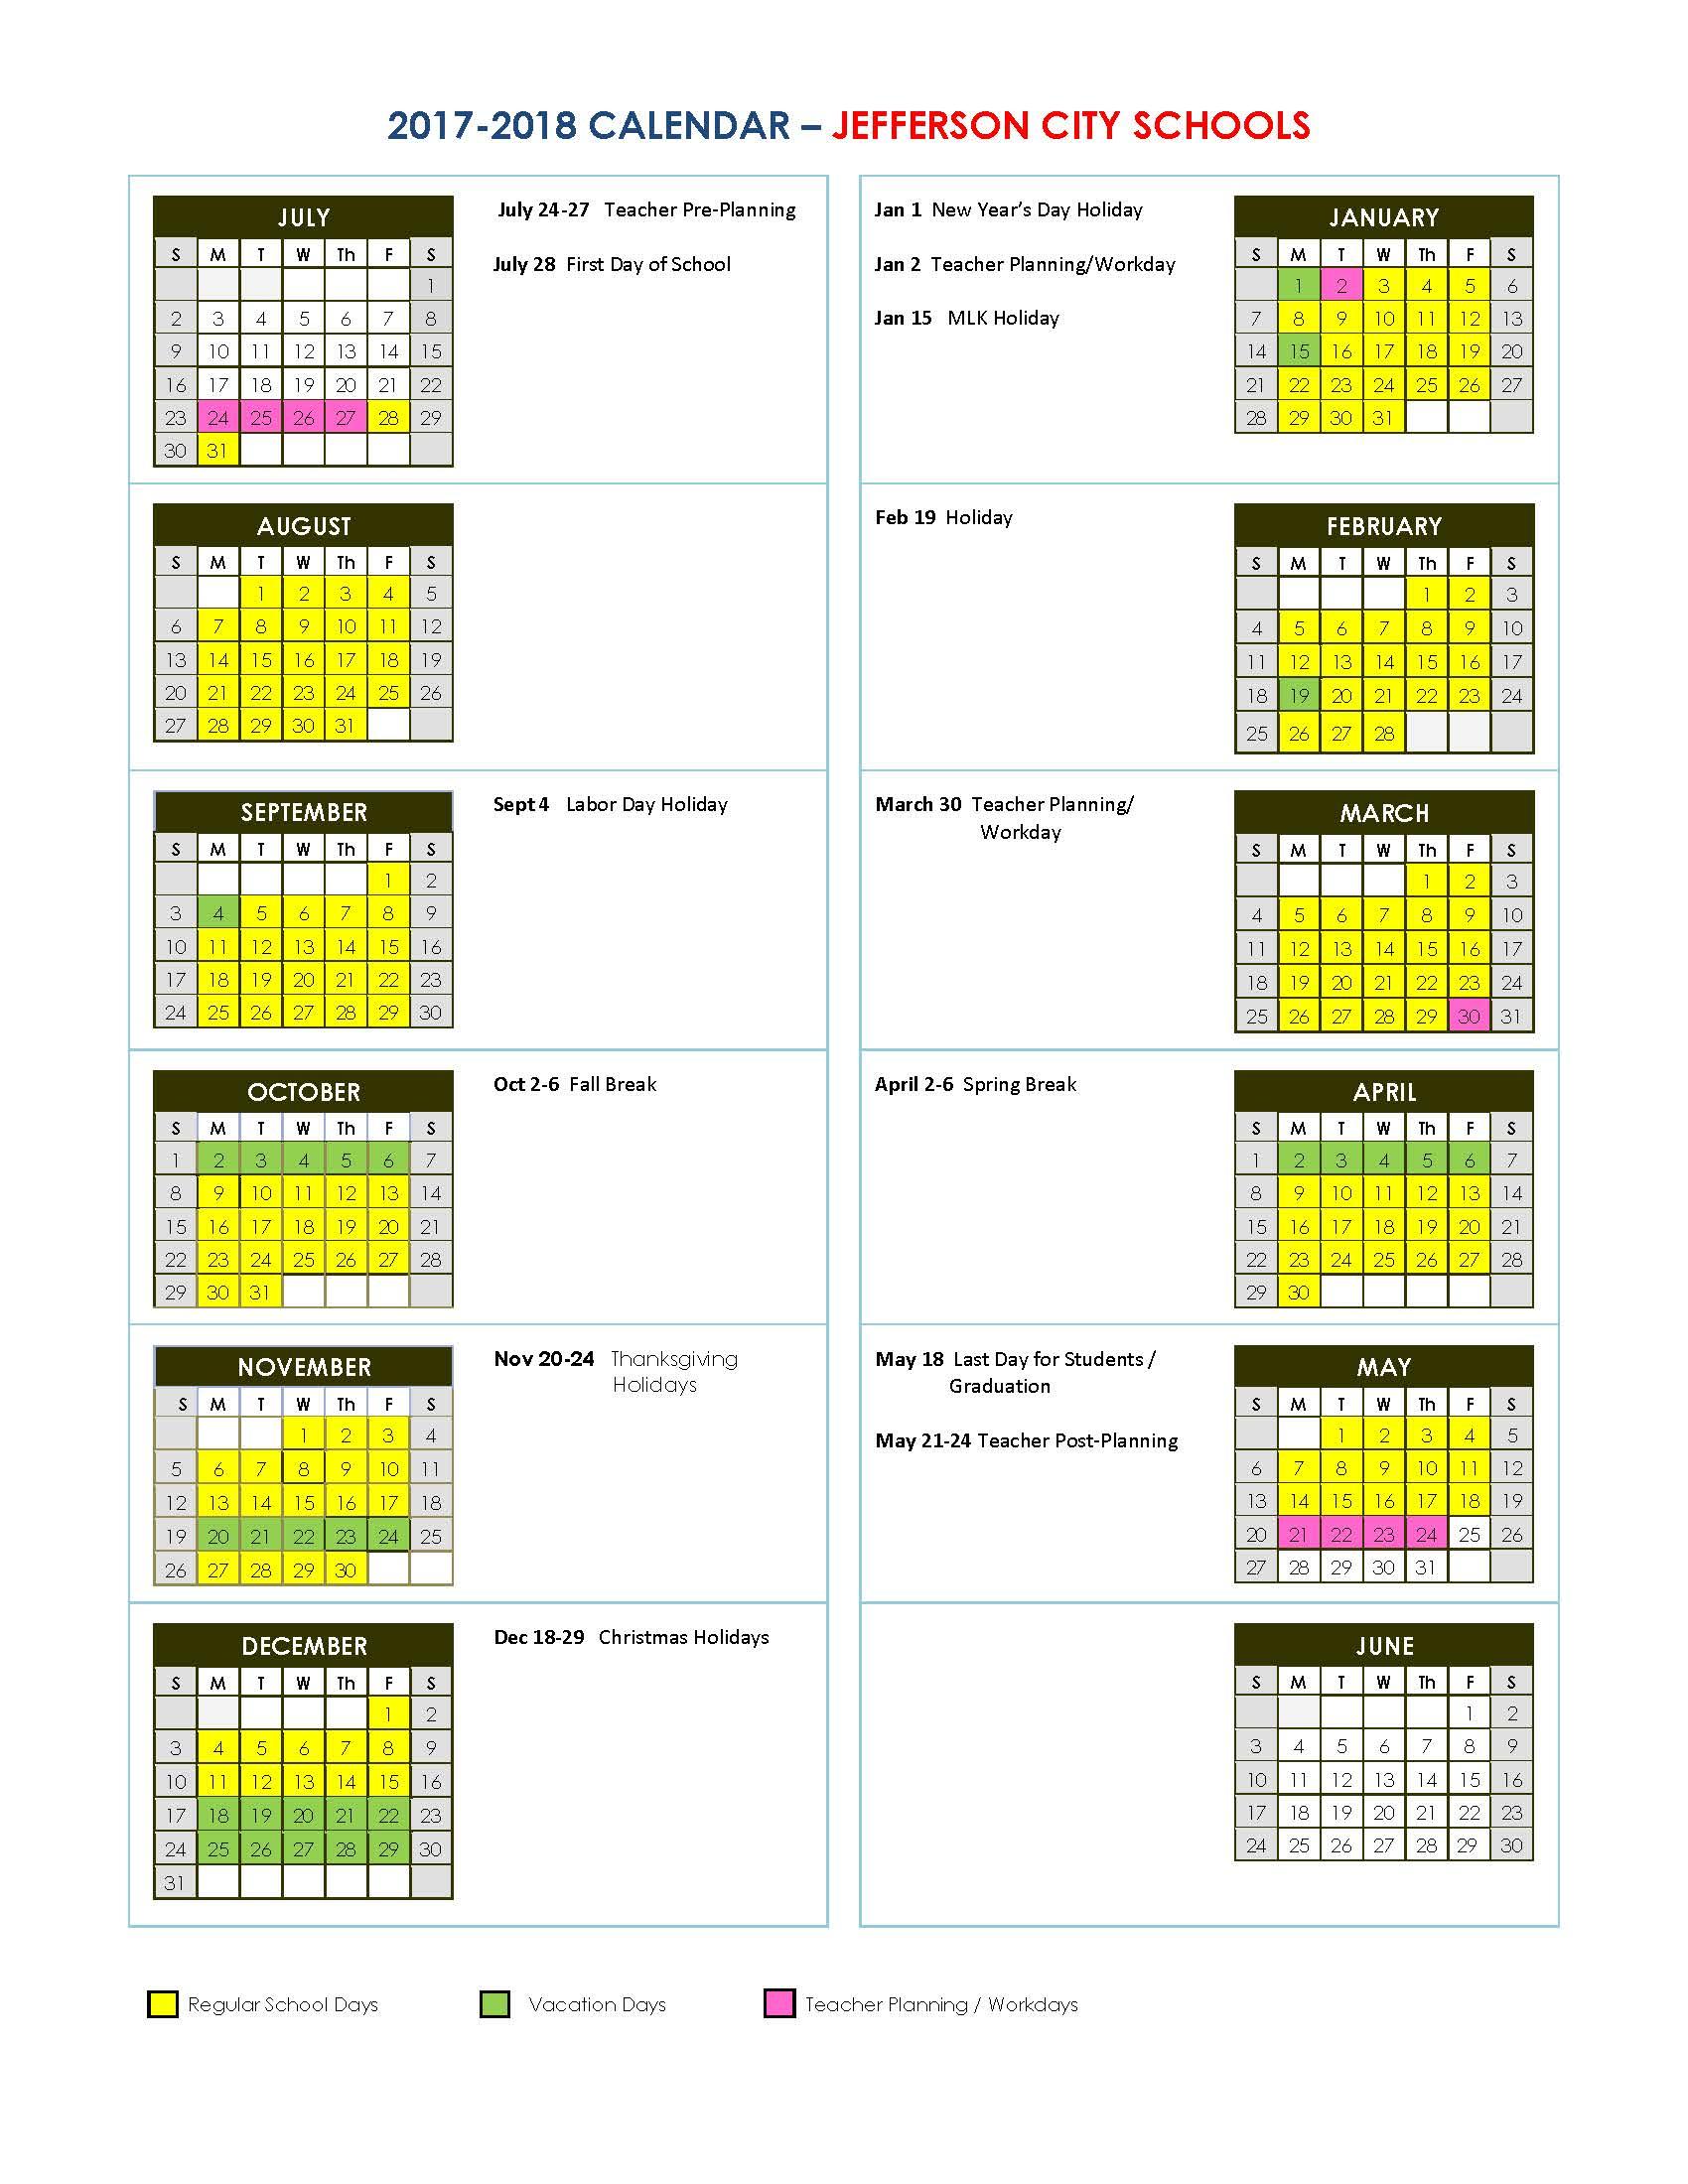 Jefferson City Schools Throughout Fayette County Georgia Public School Calendar